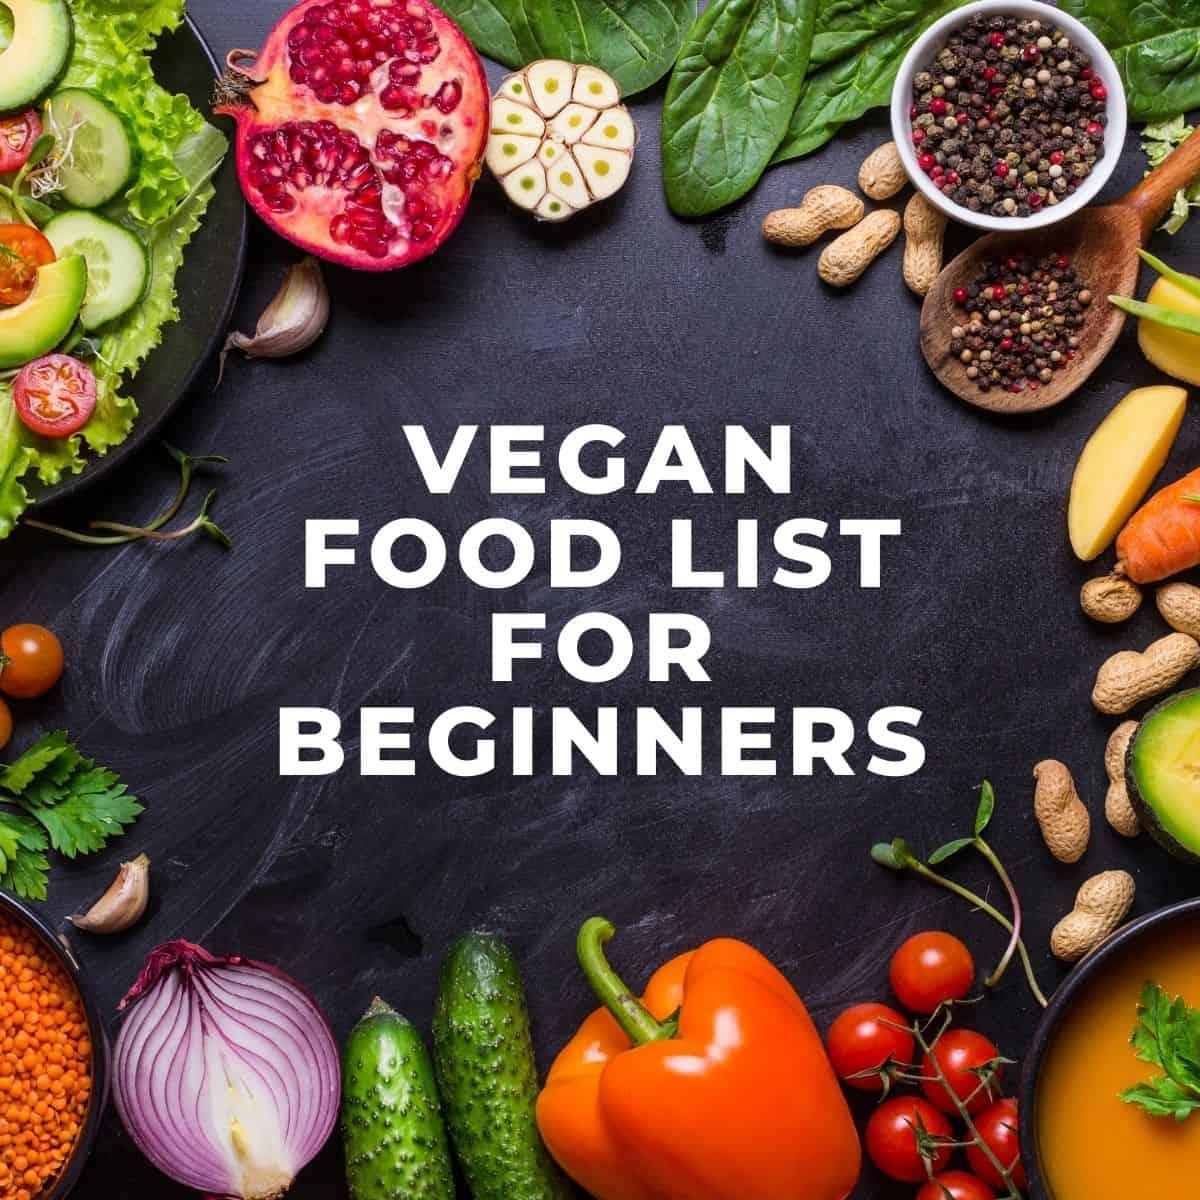 top down view of fruits, vegetables, seeds, grains on a blackboard| Vegan Food List for Beginners